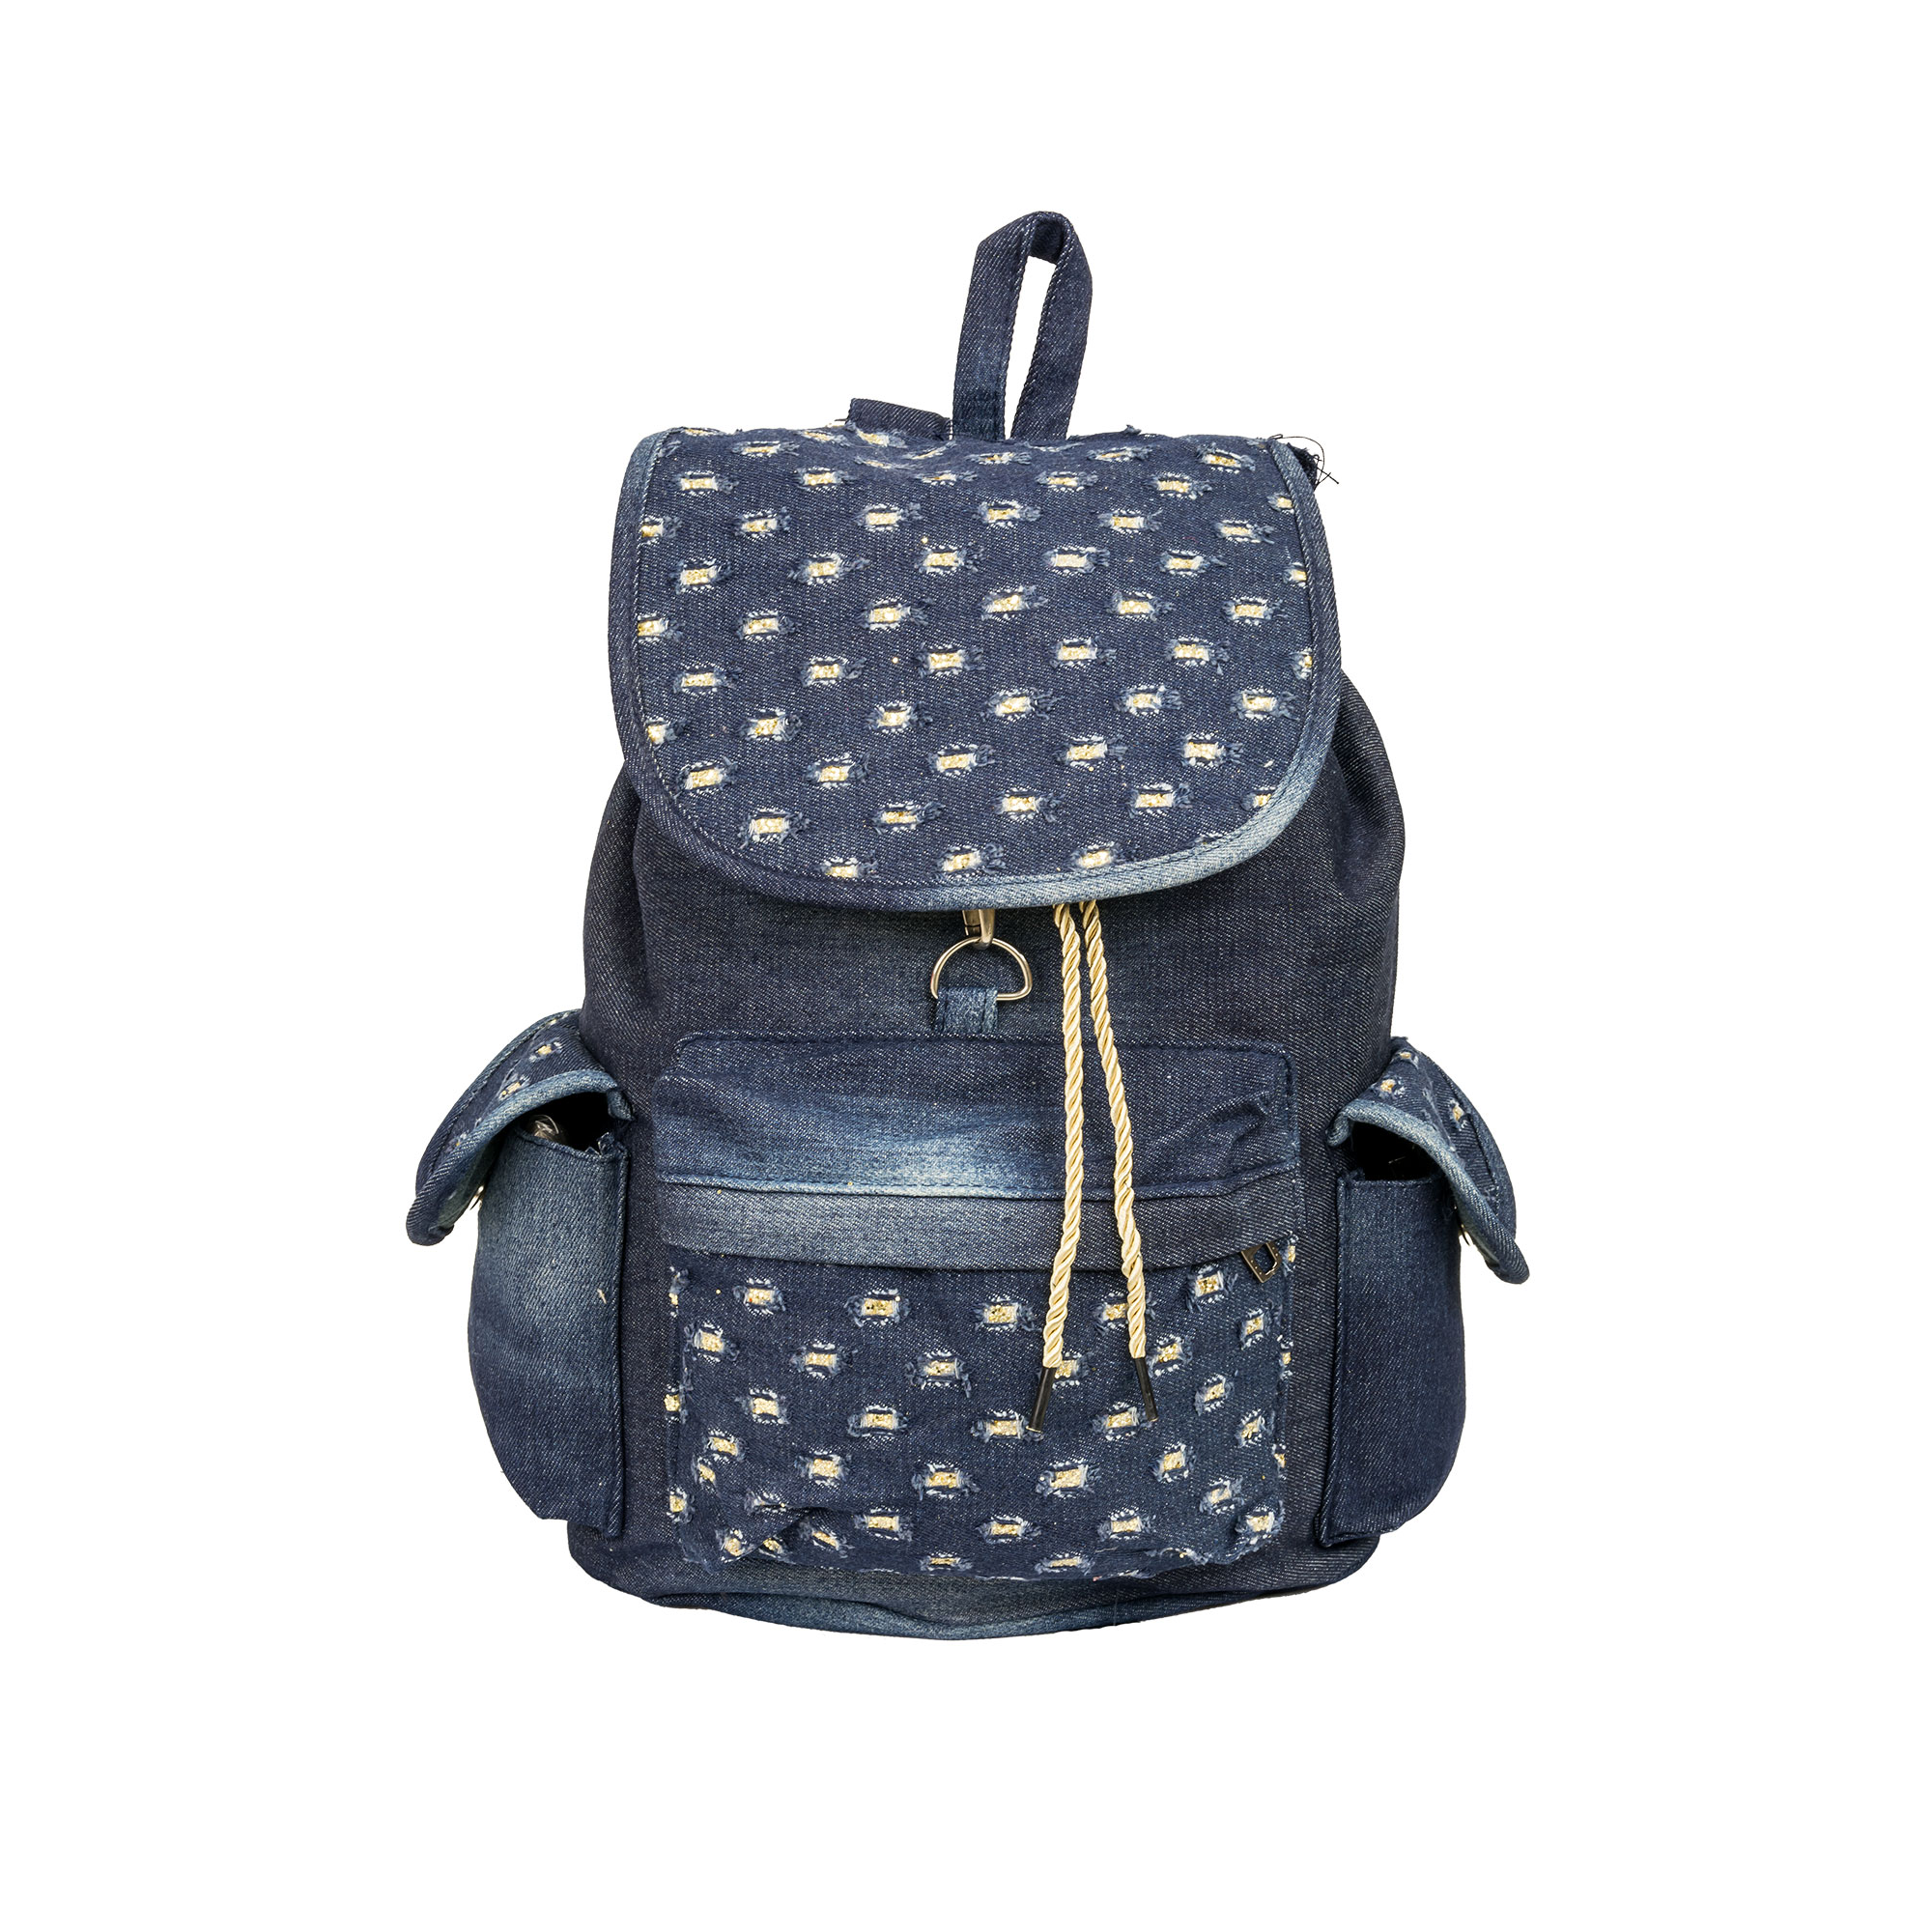 3e90f09f256 Accessories :: Τσάντες & Πορτοφόλια :: Τσάντα πλάτης Blue Jeans